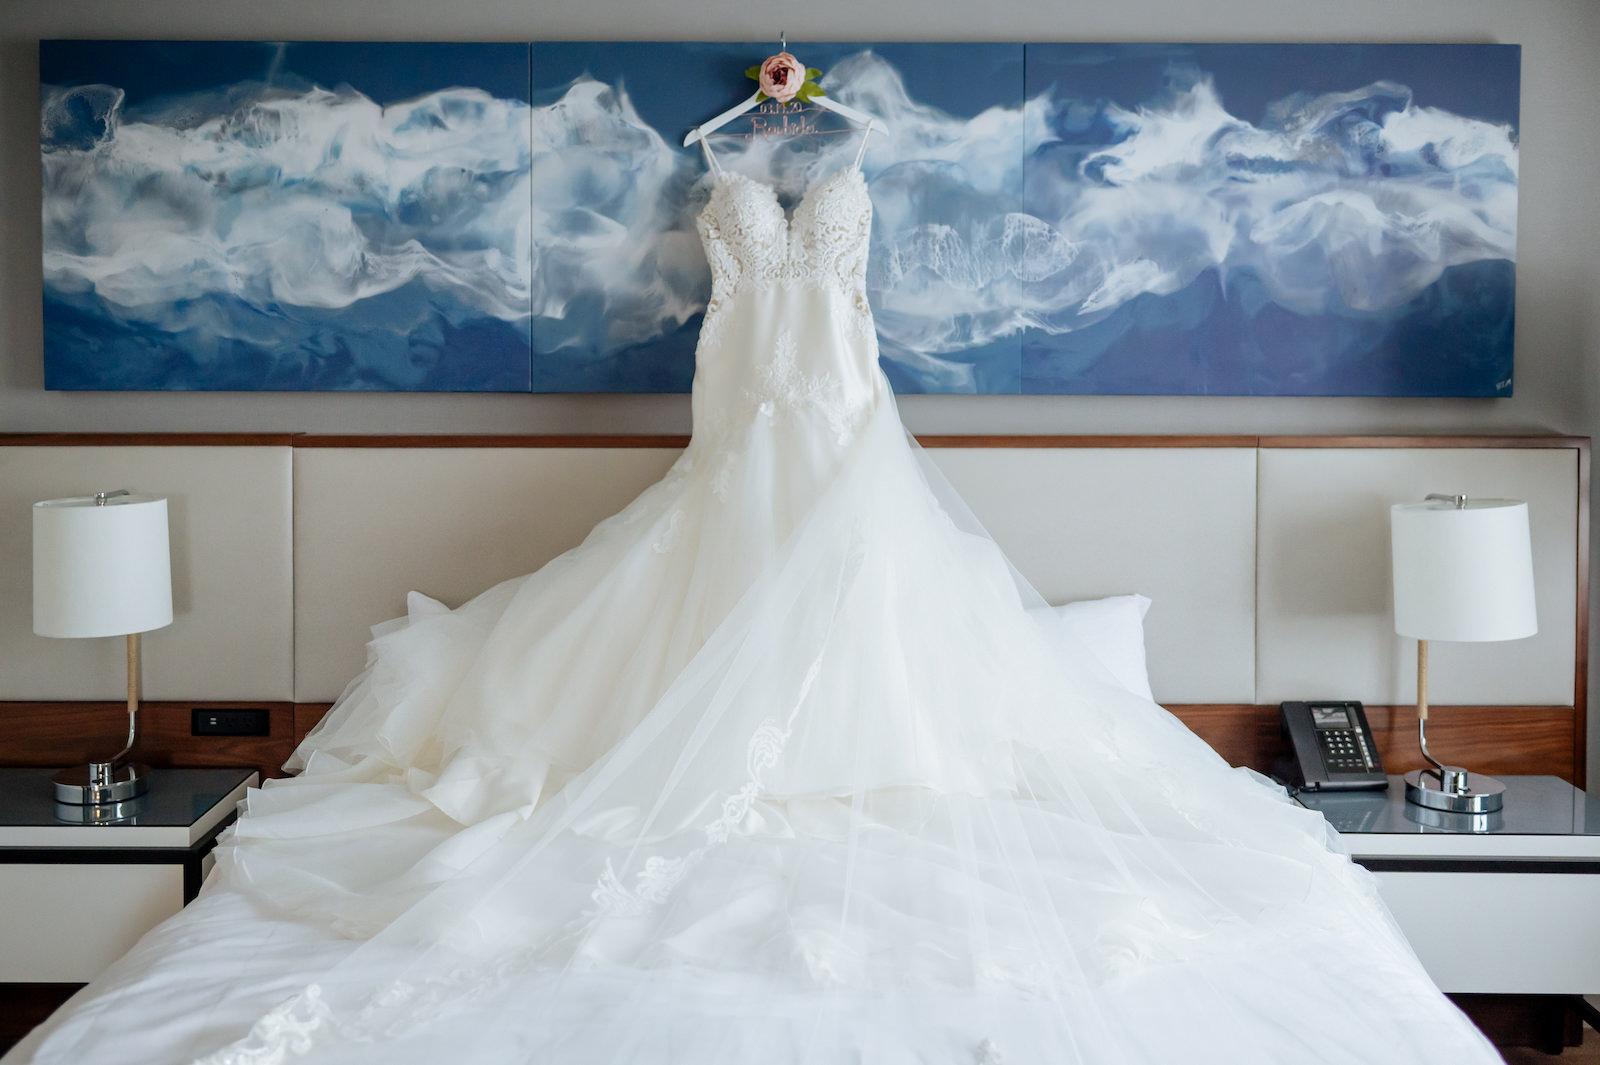 Ivory Spaghetti Strap Sweetheart Neckline Tulle Mermaid Martina Liana Wedding Dress Bridal Gown   Wedding Dress Hanger Shot with Custom Metal Name Bride Hanger